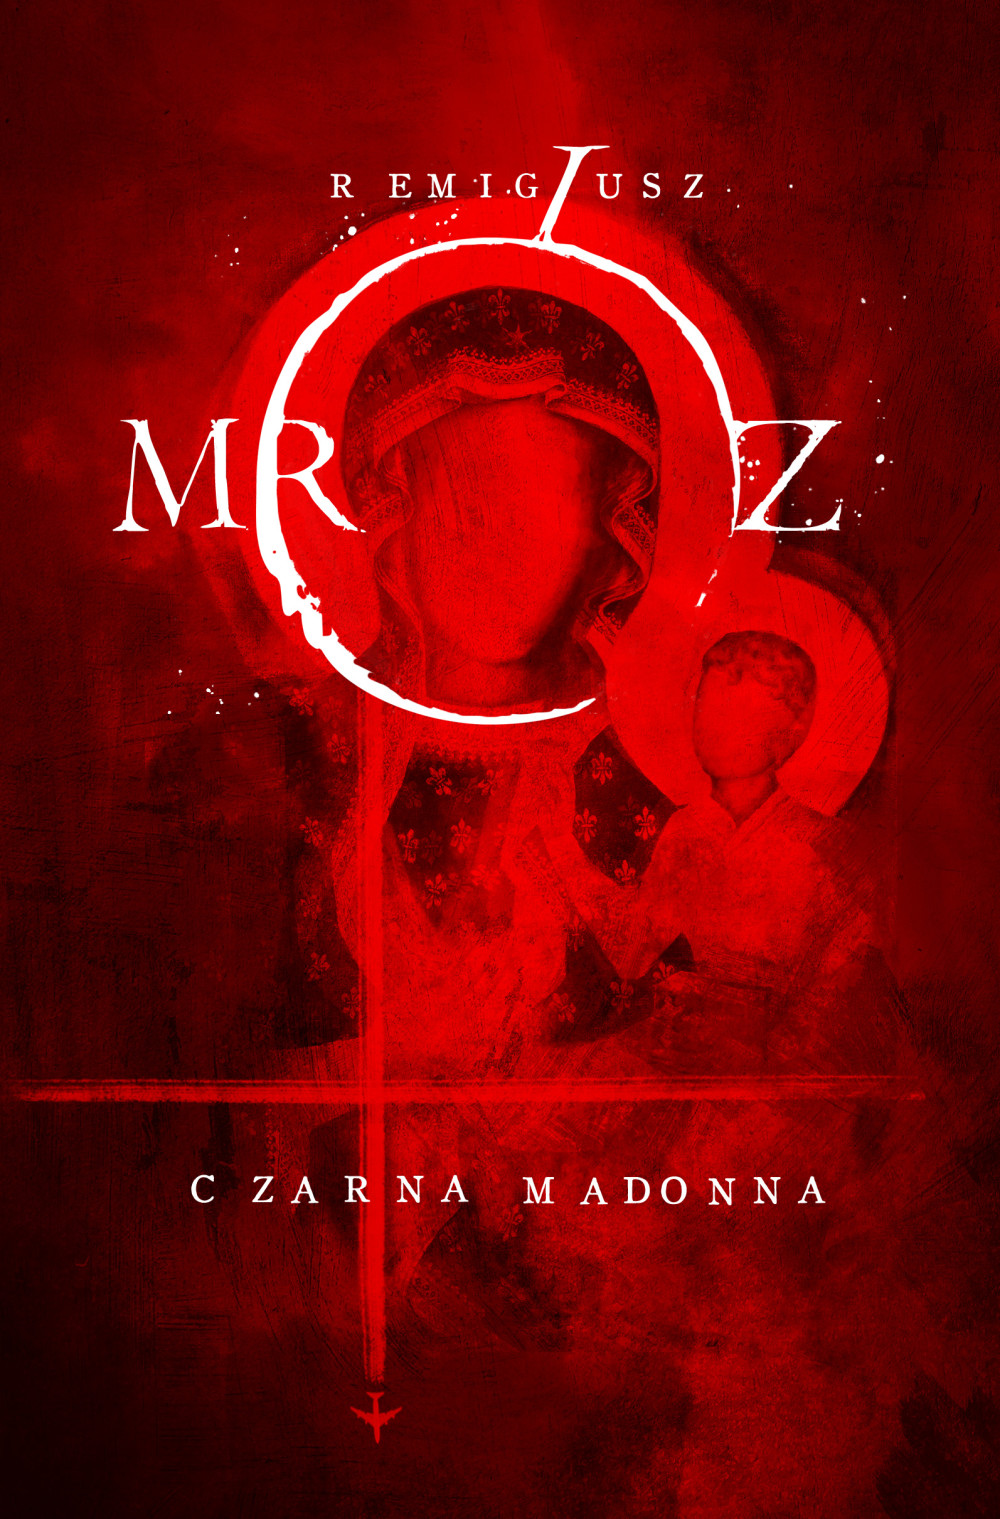 mróz,remigiusz,Czarna Madonna,Czarna,Madonna,mróz remigiusz,czarne,ebook, ebooki,kryminał,sensacja,pielgrzym,sekret